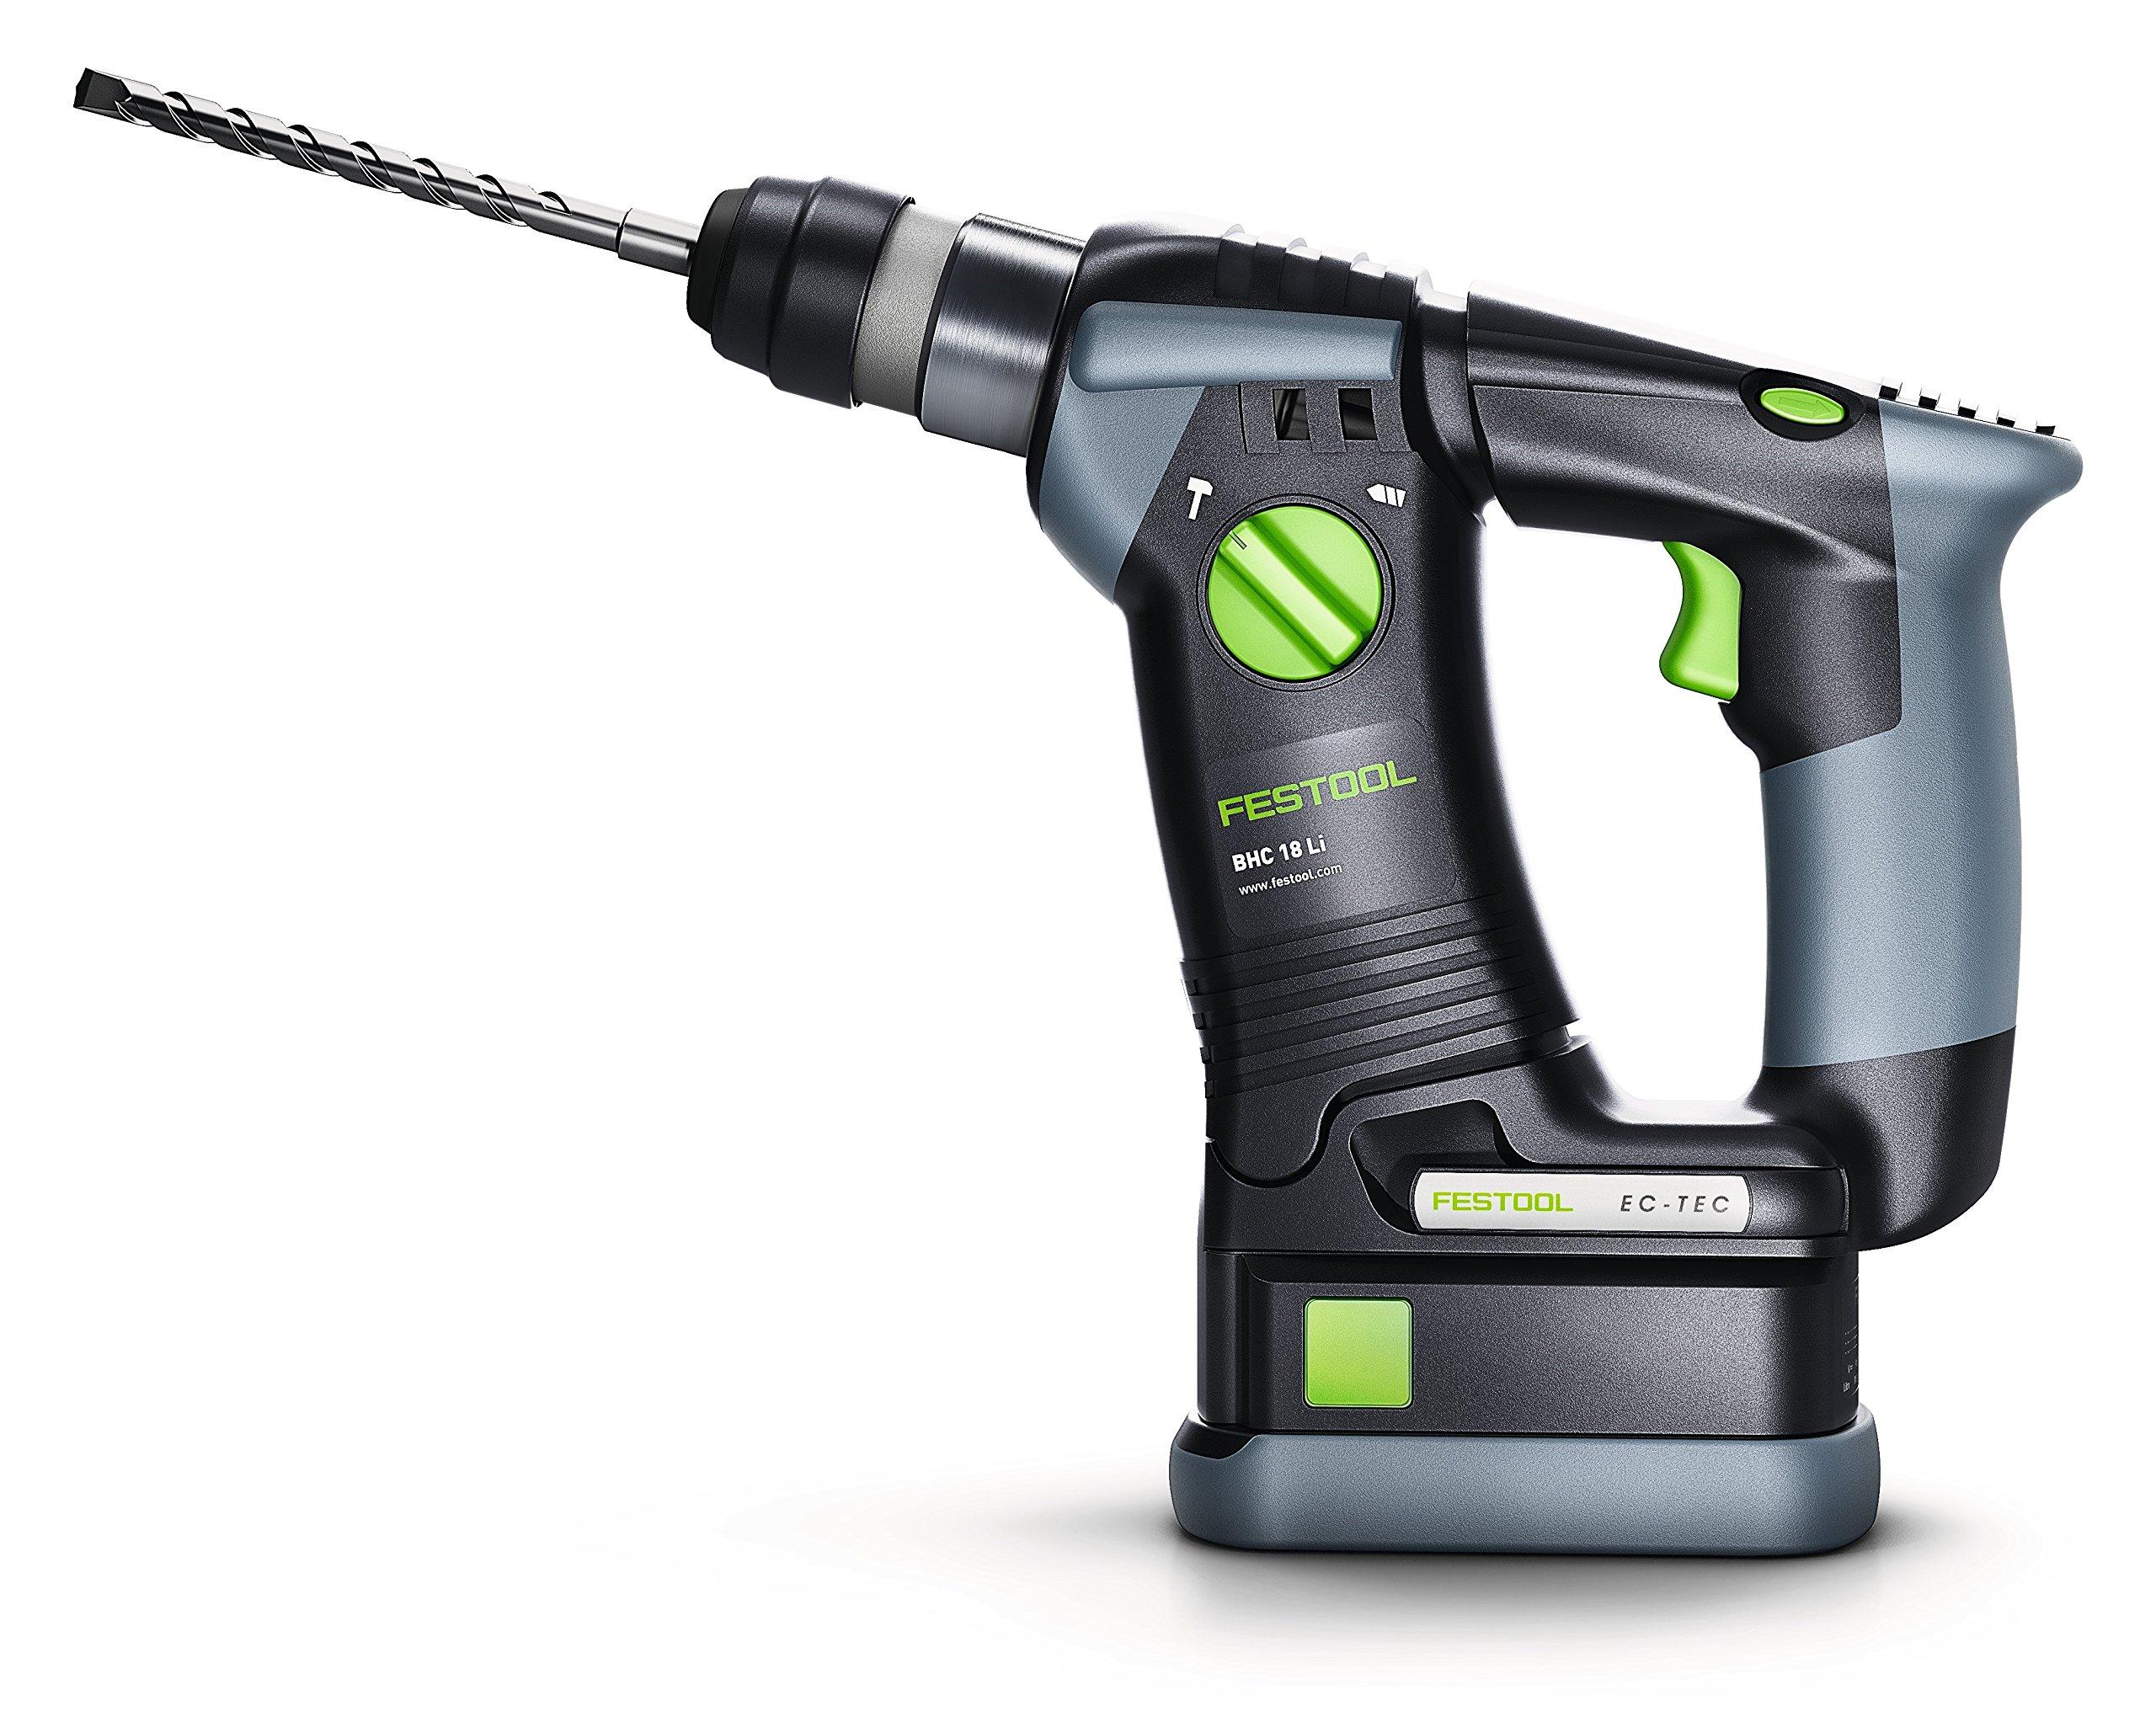 Festool BHC18Li5.2 Set 564598 Cordless Hammer Drill